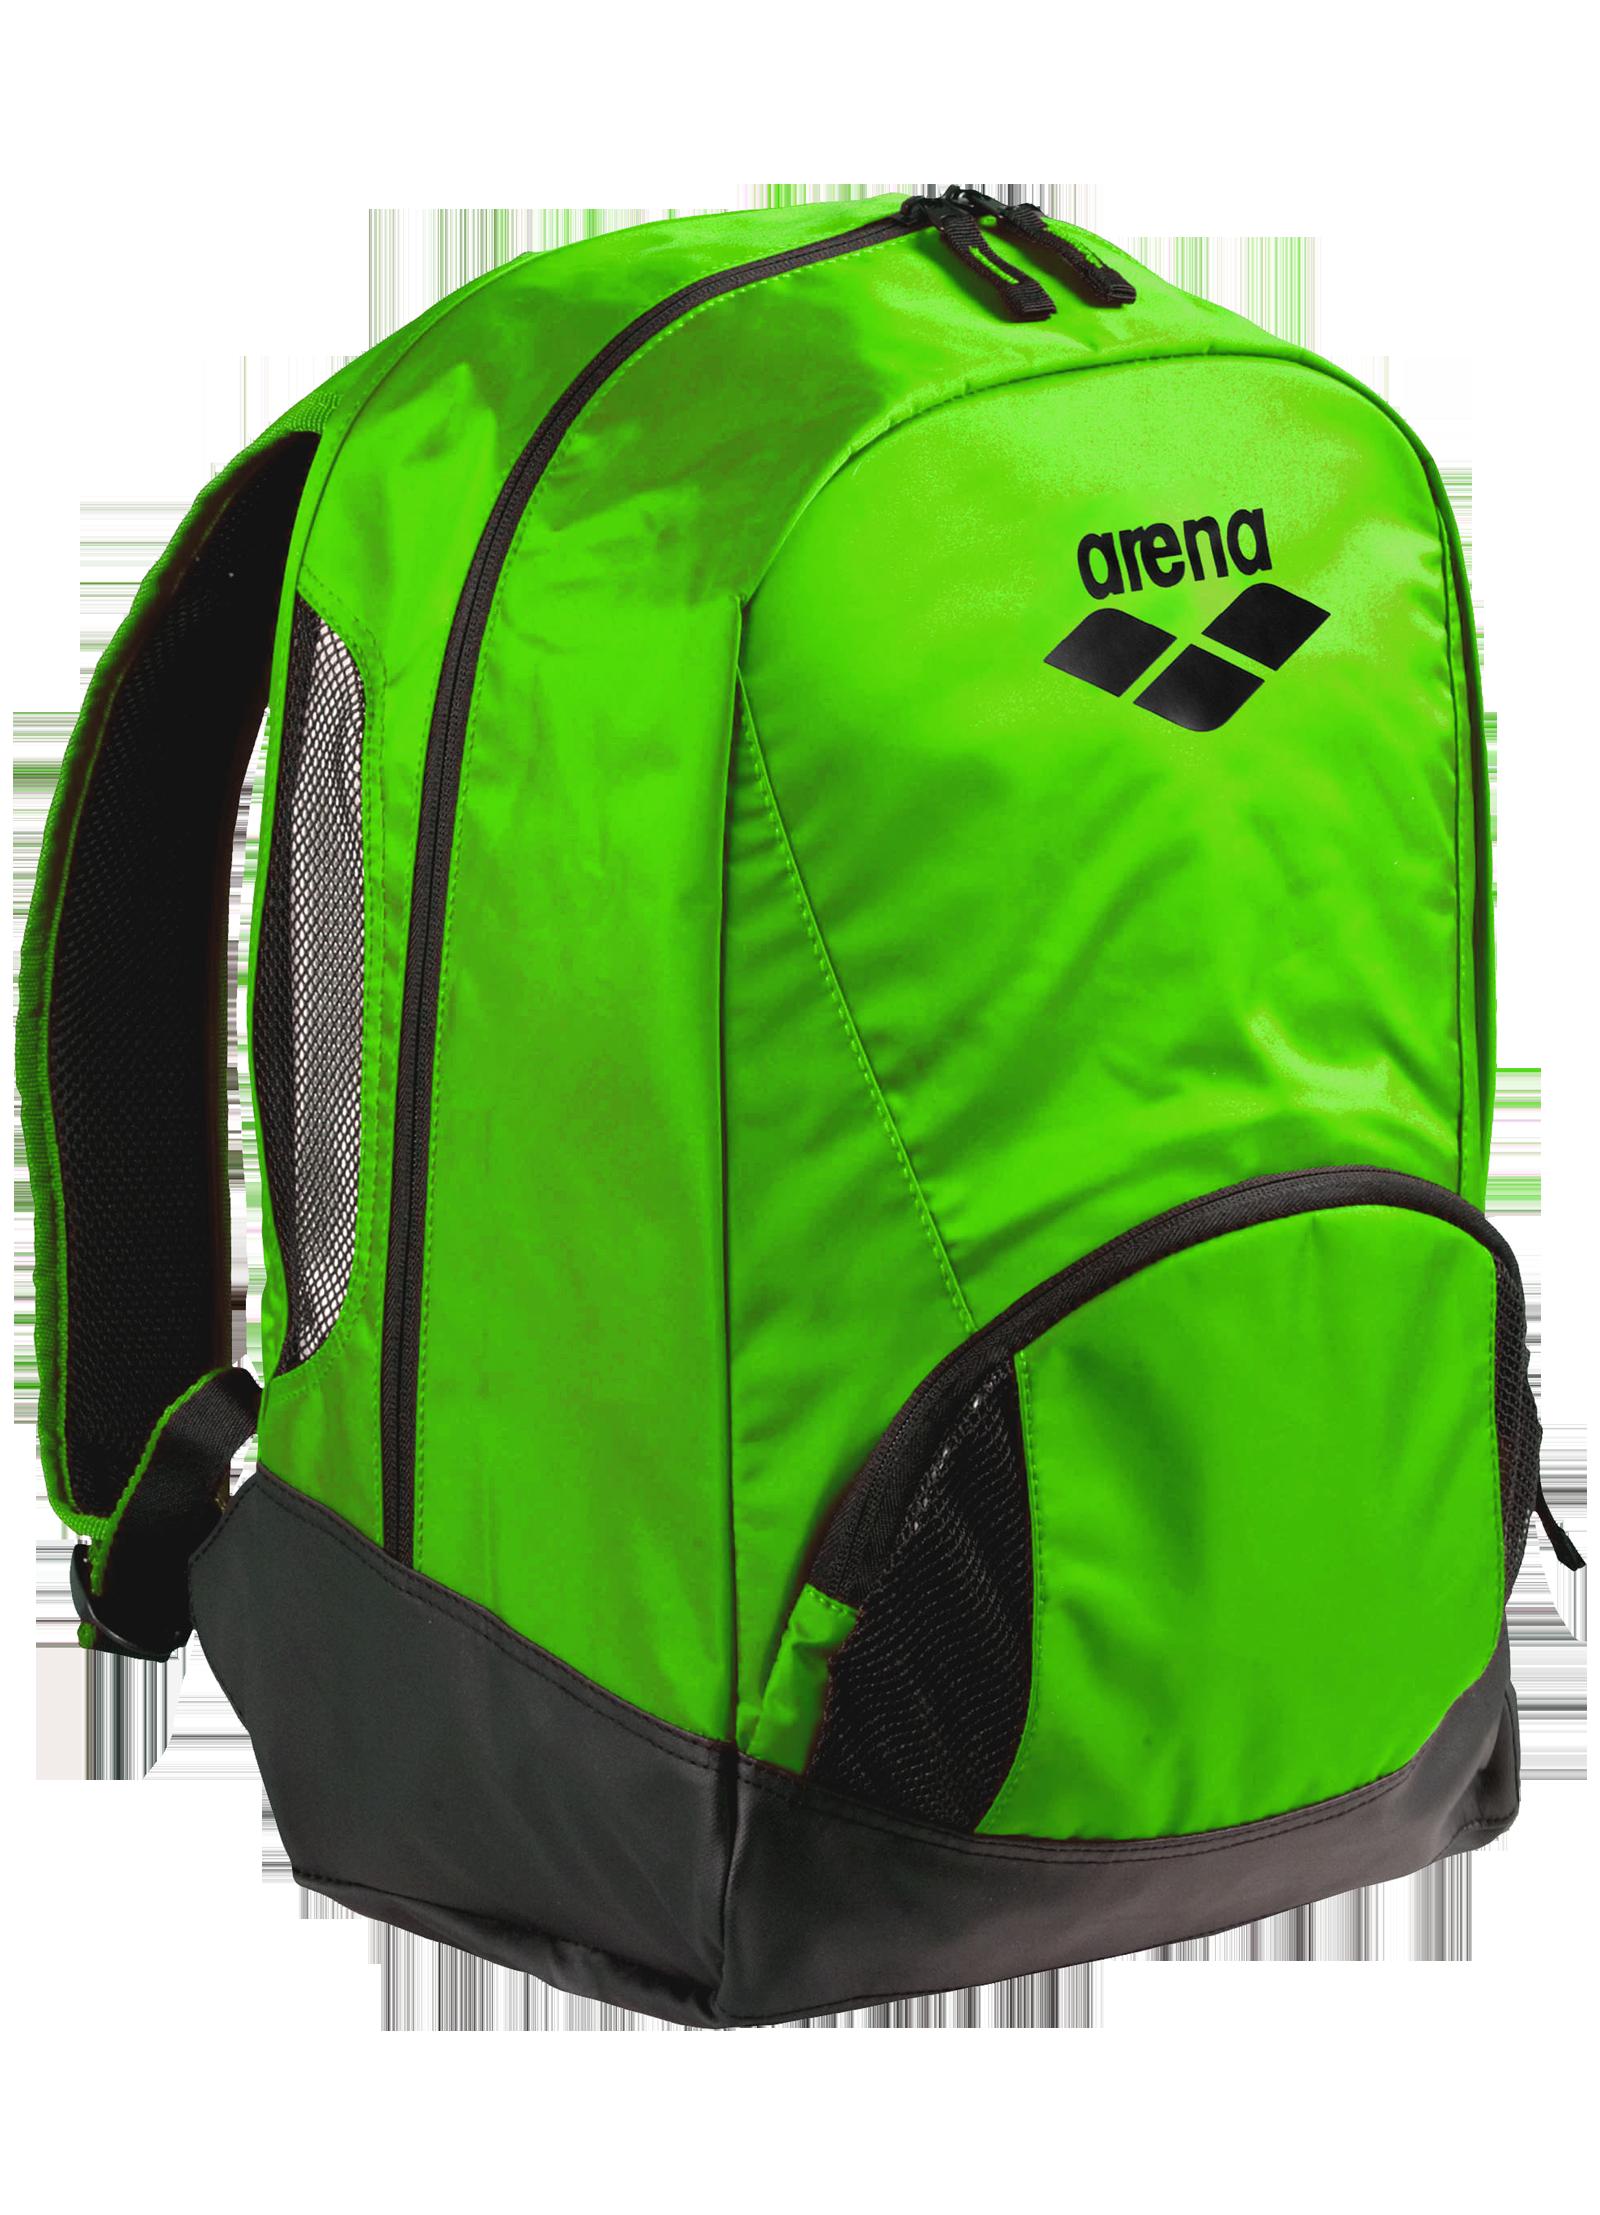 Bookbag clipart green backpack. Png image